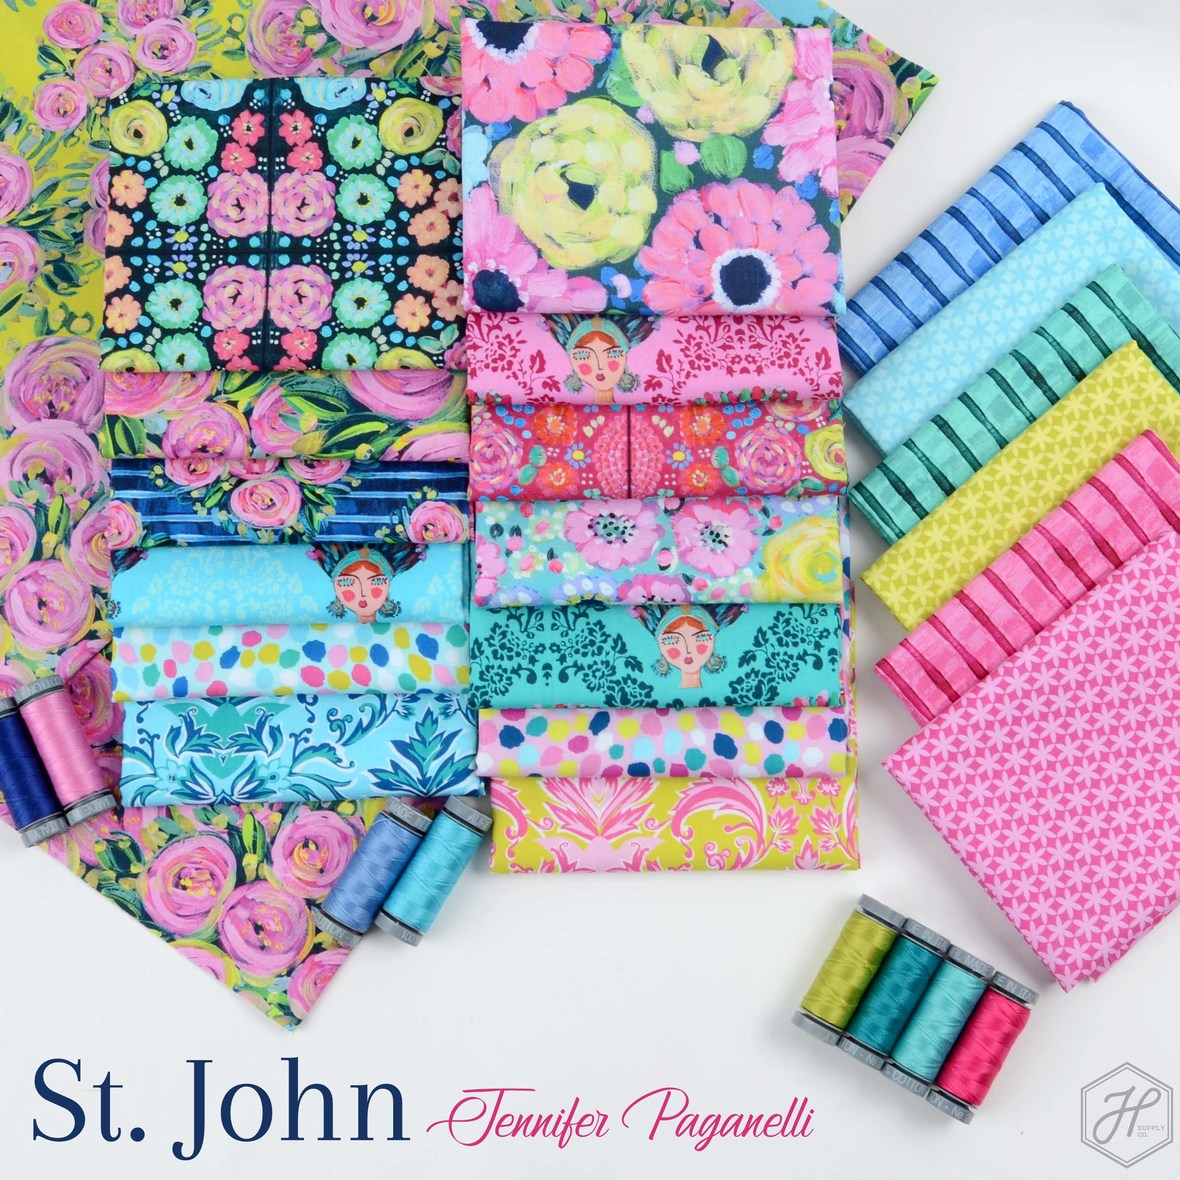 St John Fabric Jennifer Paganelli at Hawthorne Supply Co